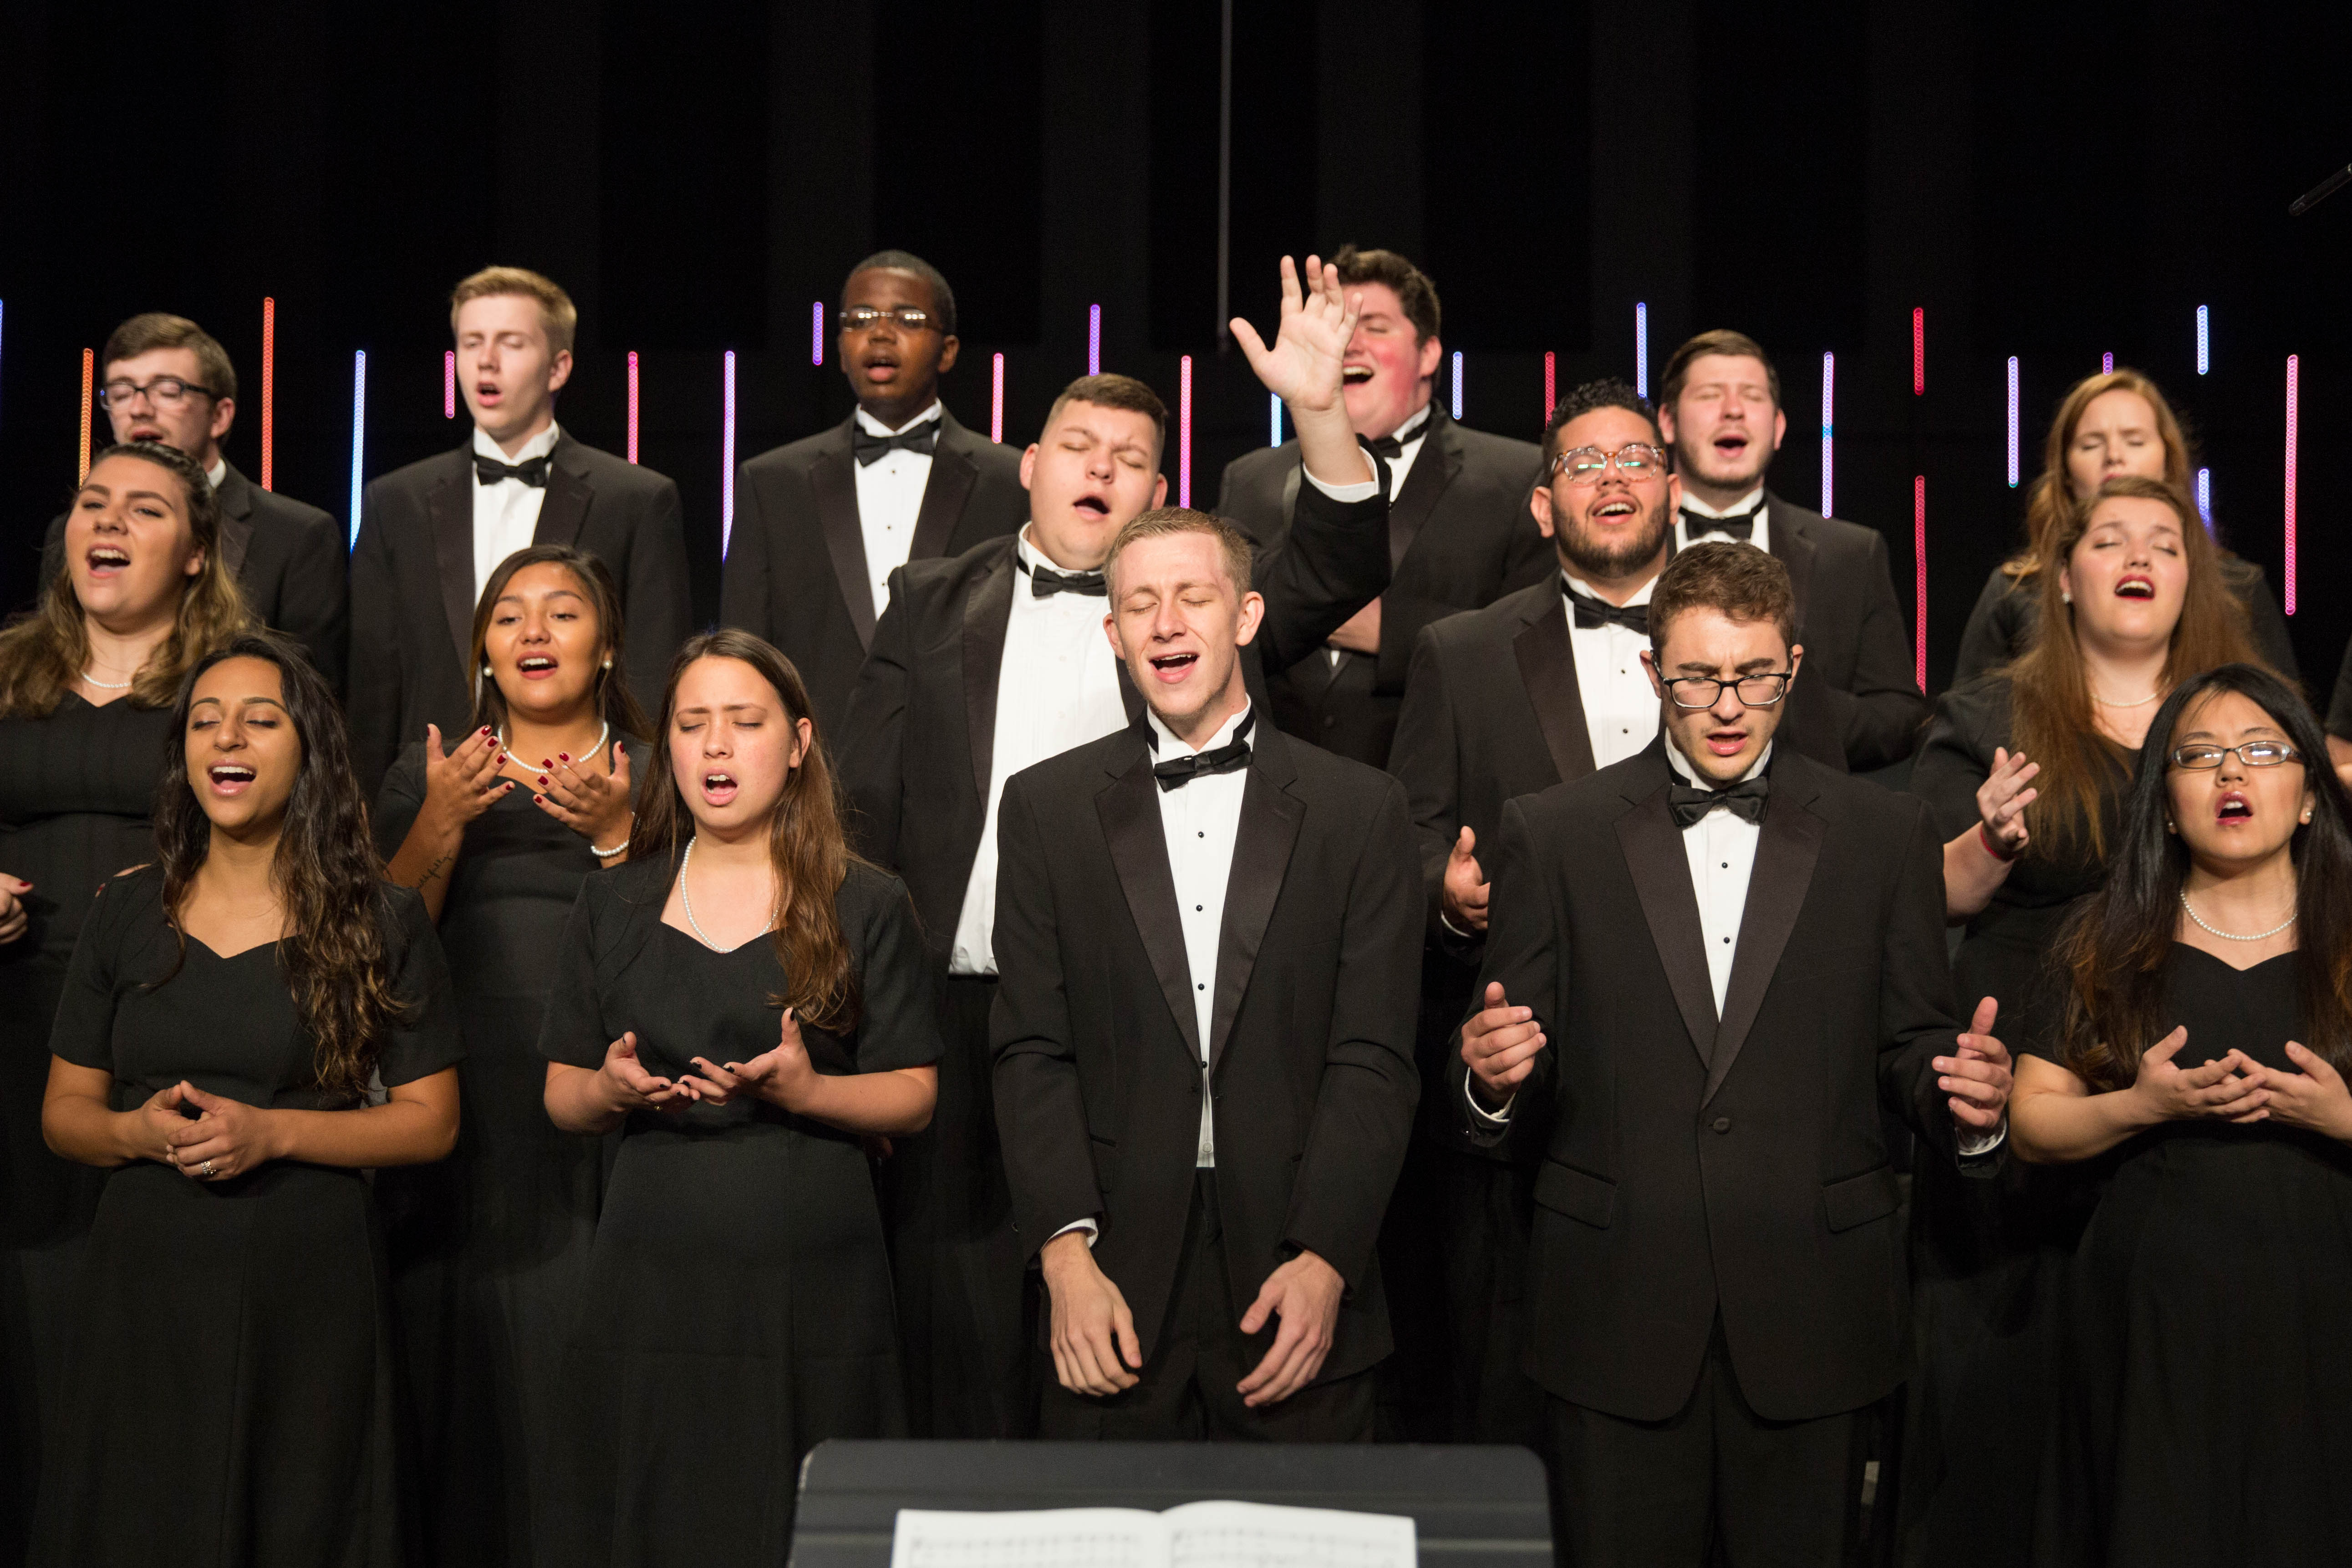 University Choir singing